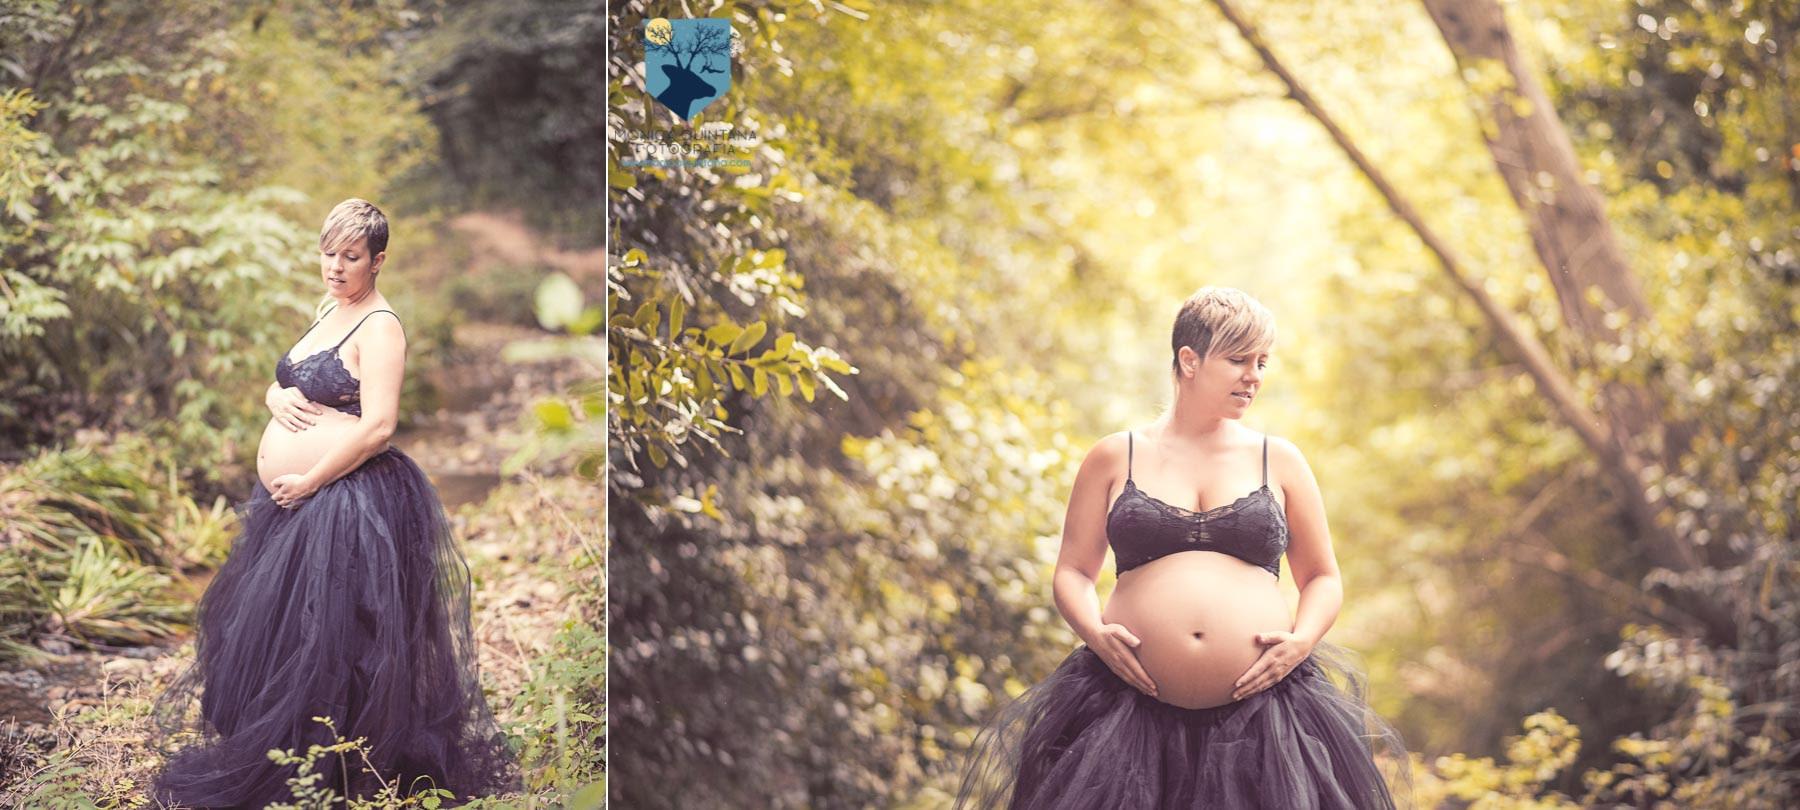 fotografia,girona,figueres,emporda,monica quintana,familia,retrato,embarazo,embarazada,amor,naturaleza,embaras,natura,fotos